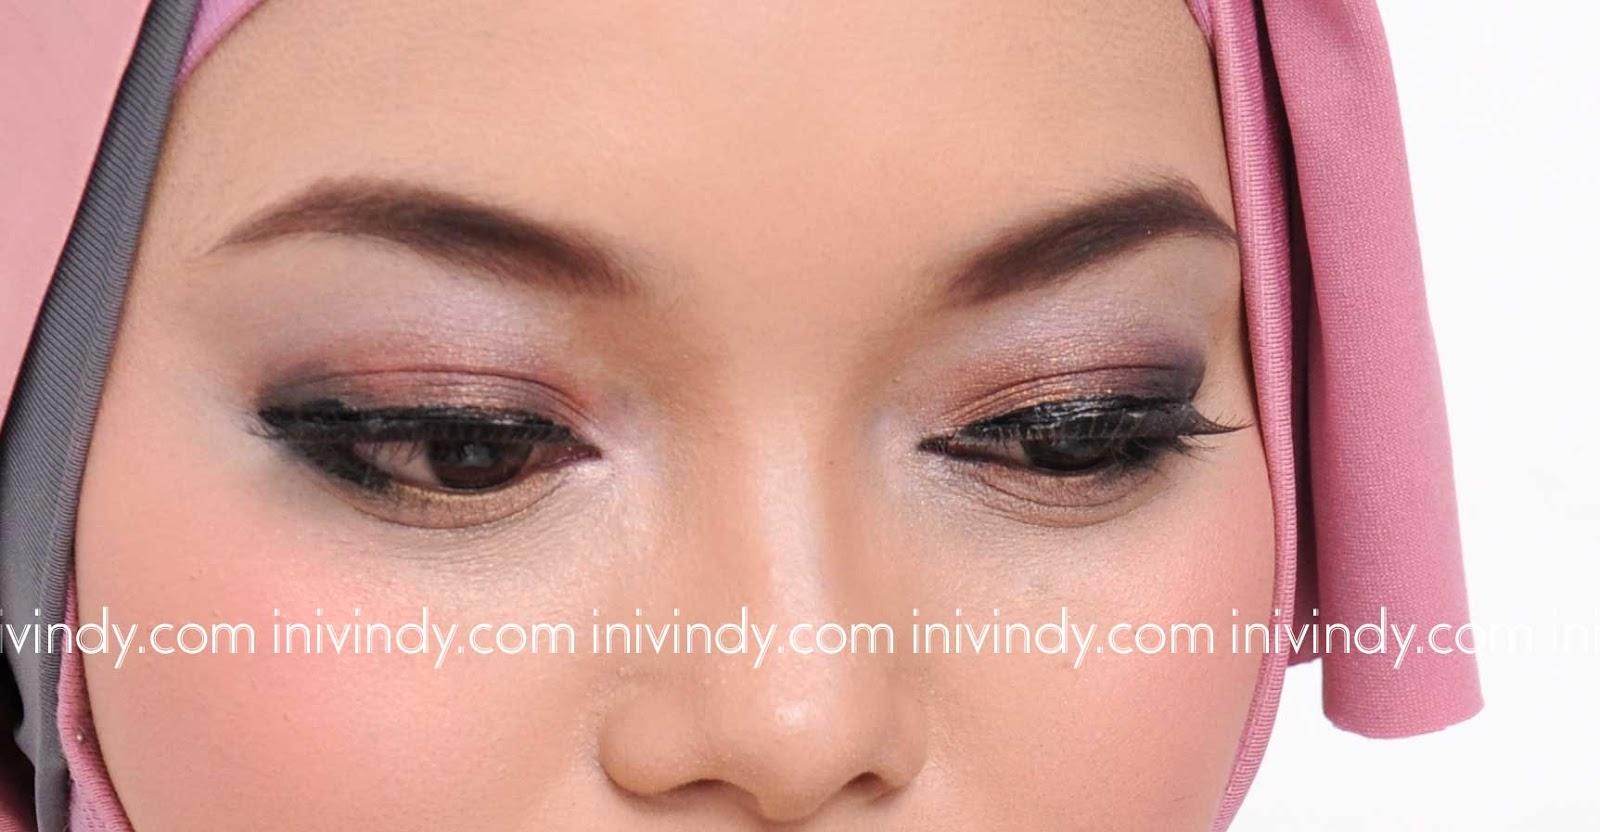 Hijab Beauty: March 2013